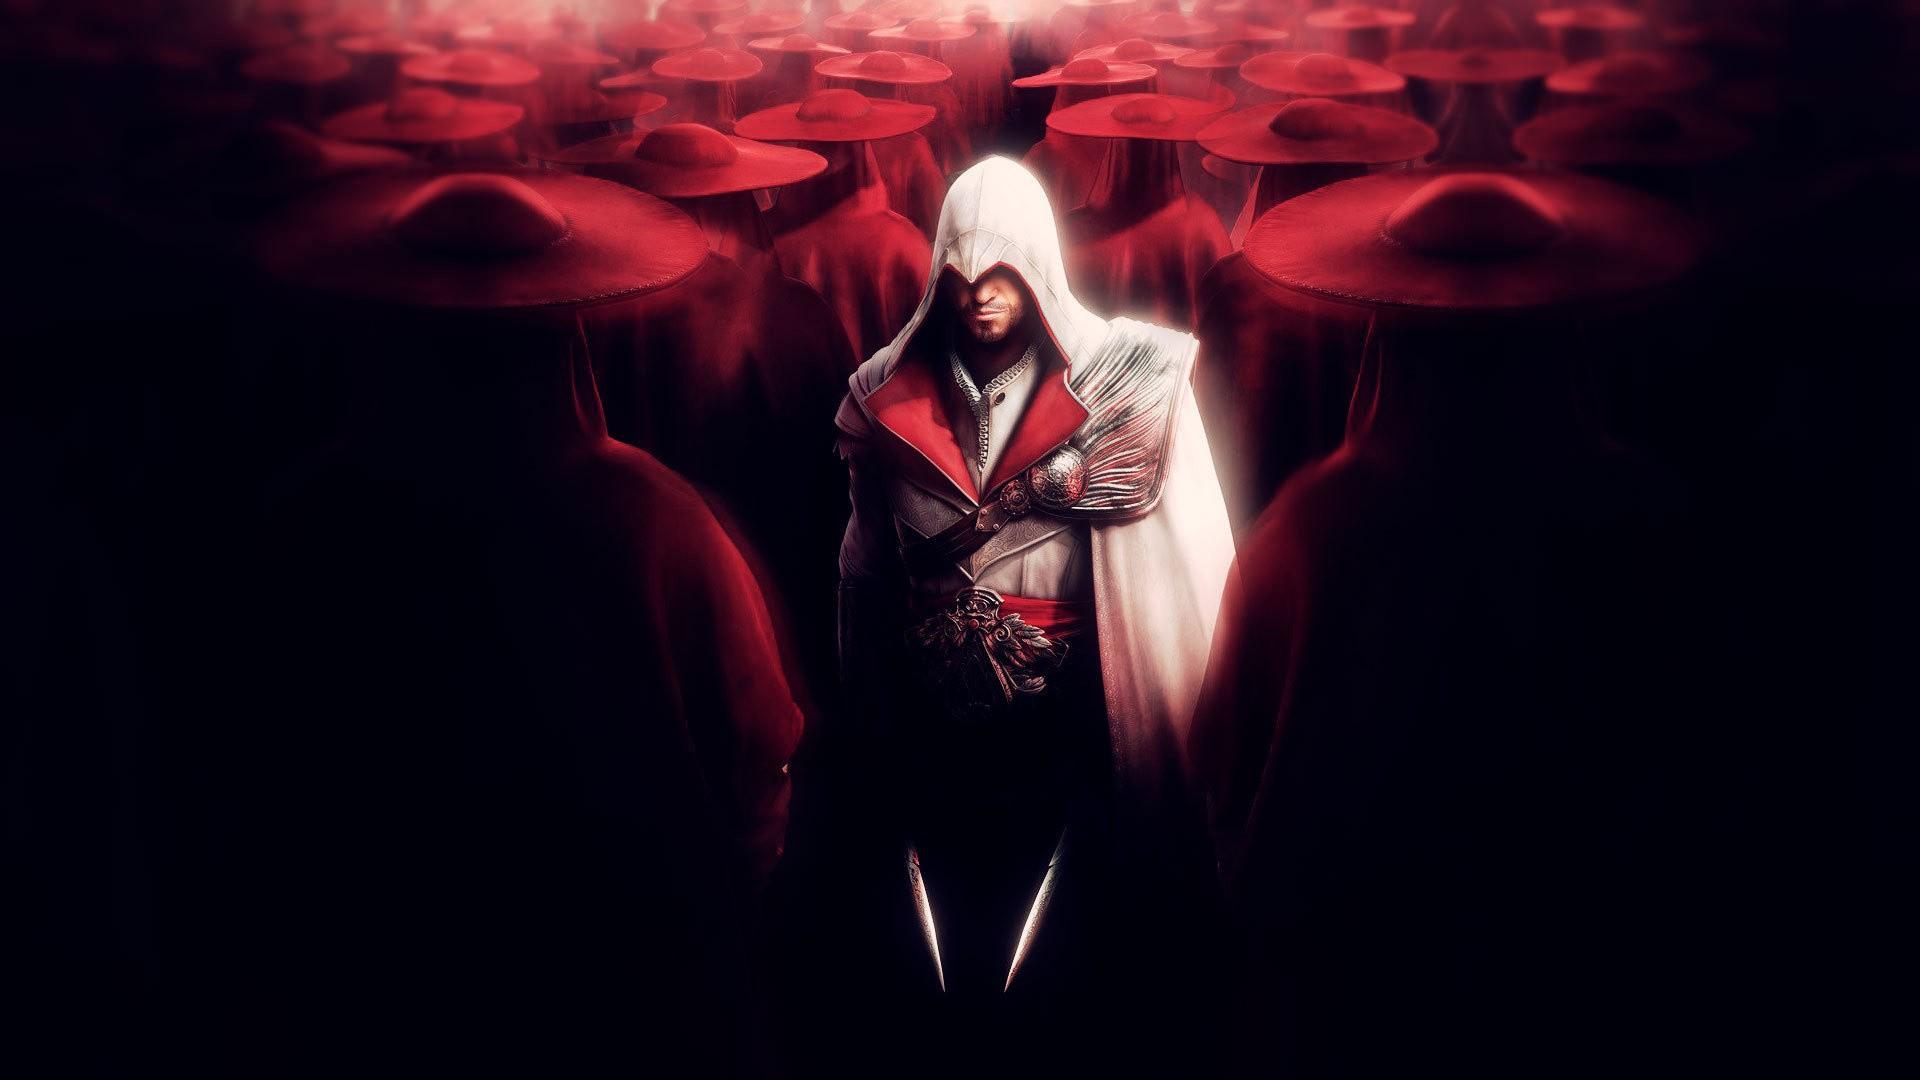 [44+] Assassin's Creed Wallpaper 1920x1080 on WallpaperSafariAssassins Creed Brotherhood Wallpaper 1920x1080